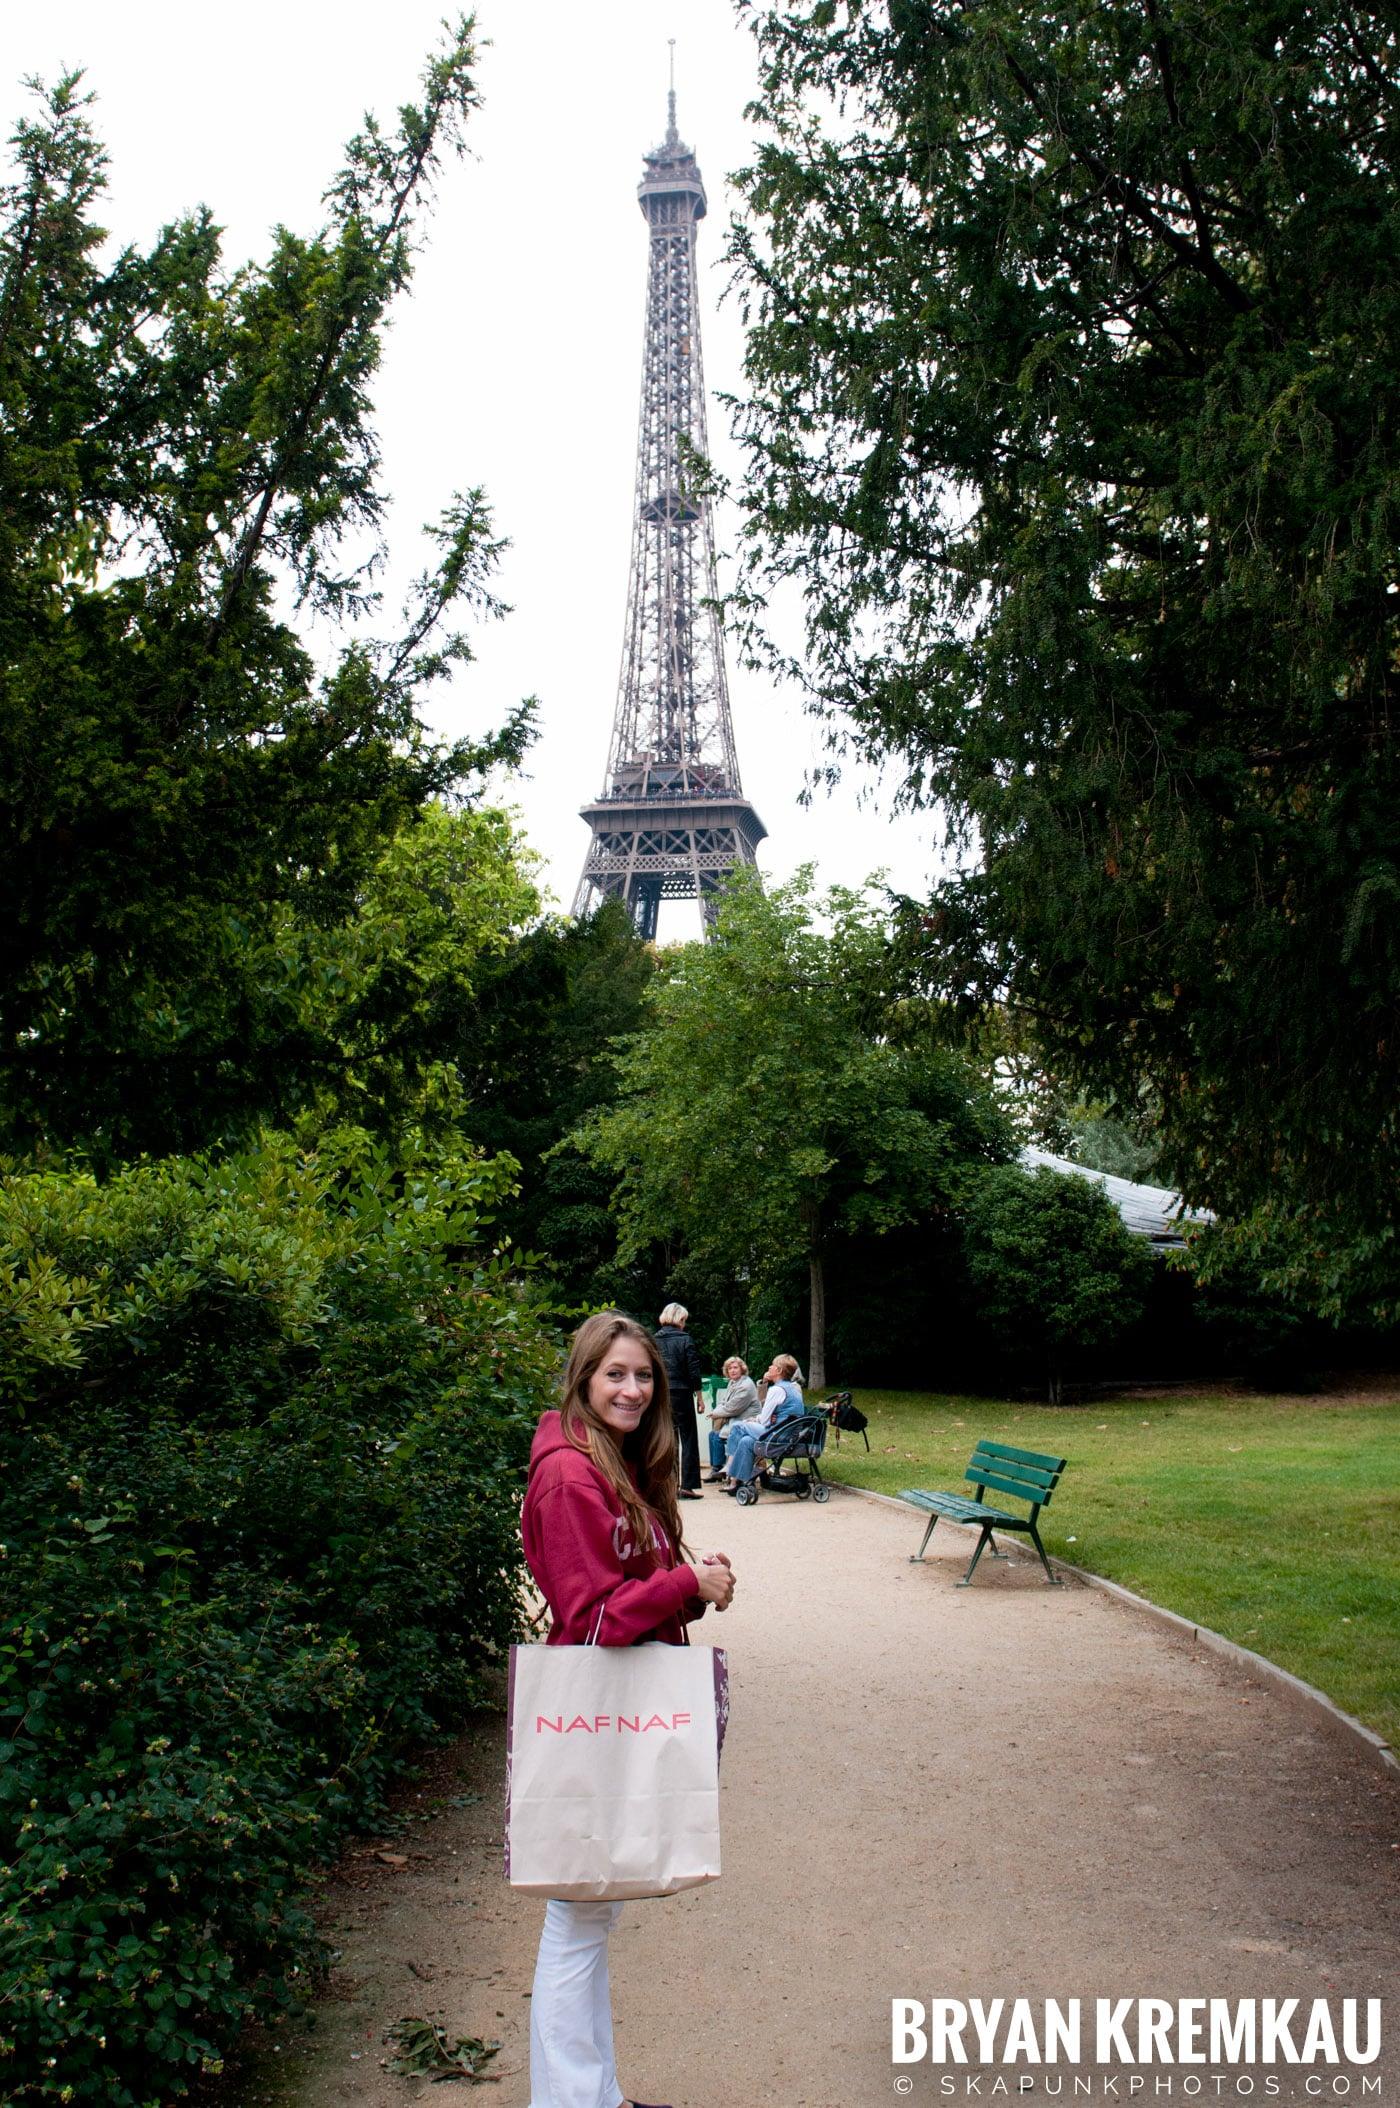 Paris, France Honeymoon - Day 3 - 7.20.11 (8)